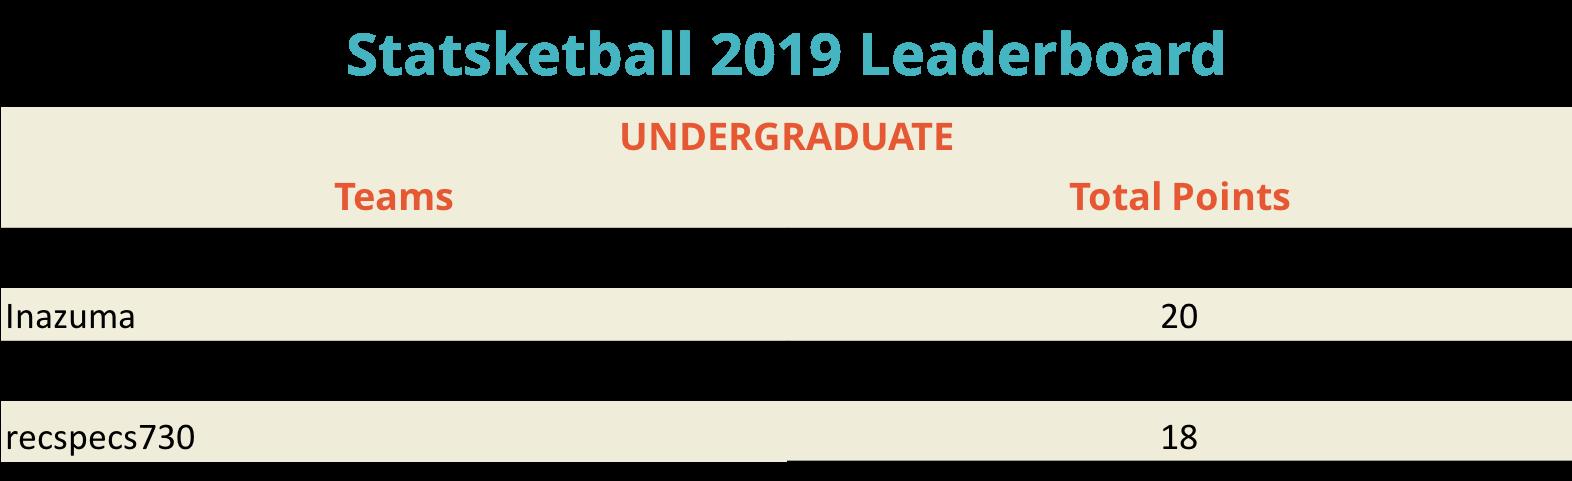 UnderGrad 325219_Statsketball Leaderboard